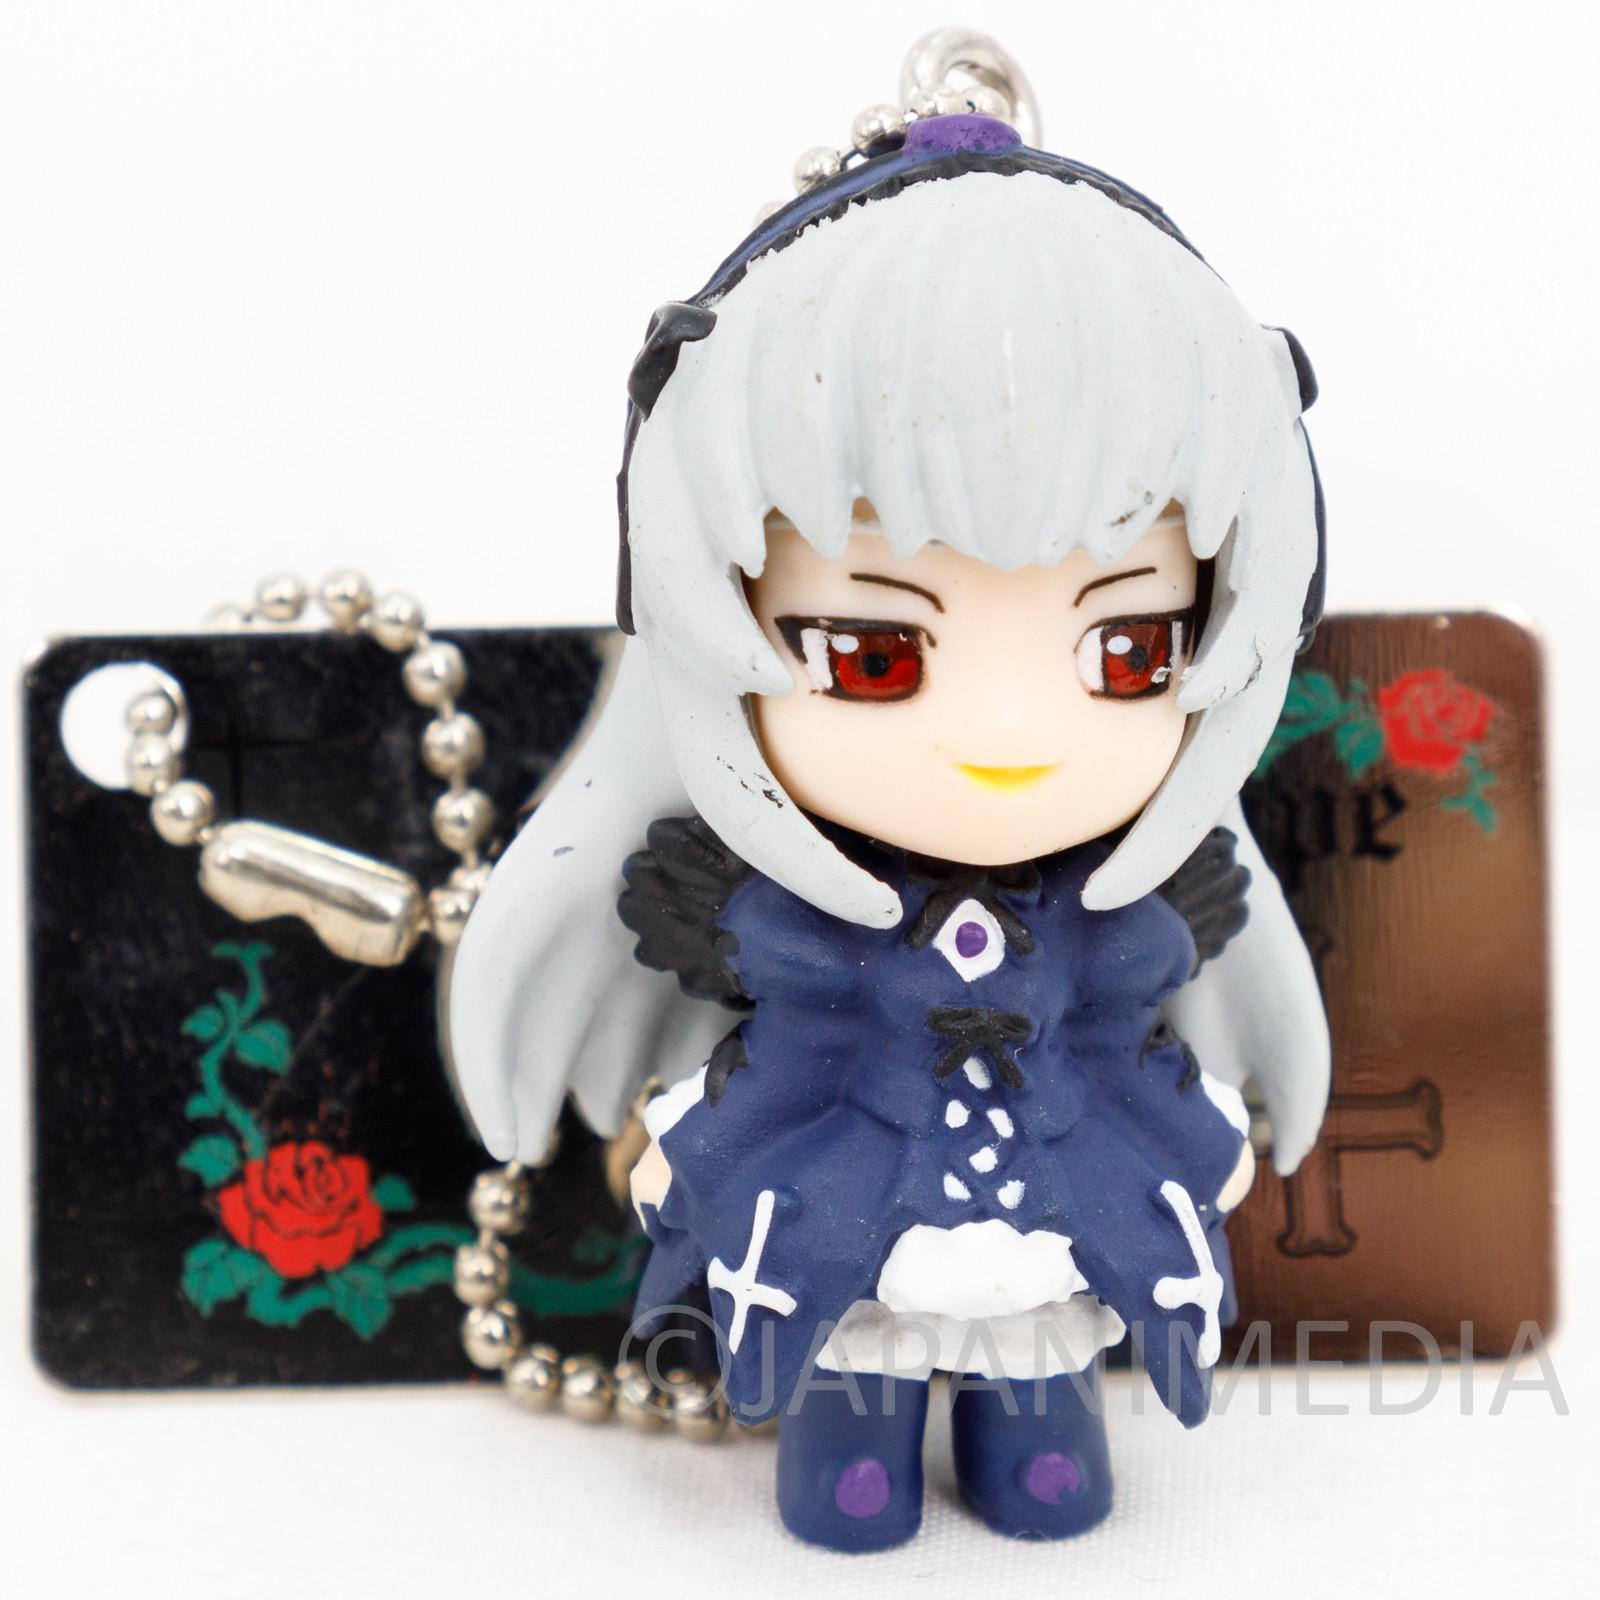 Rozen Maiden Suigintou Mascot Figure Ballchain Yujin JAPAN ANIME